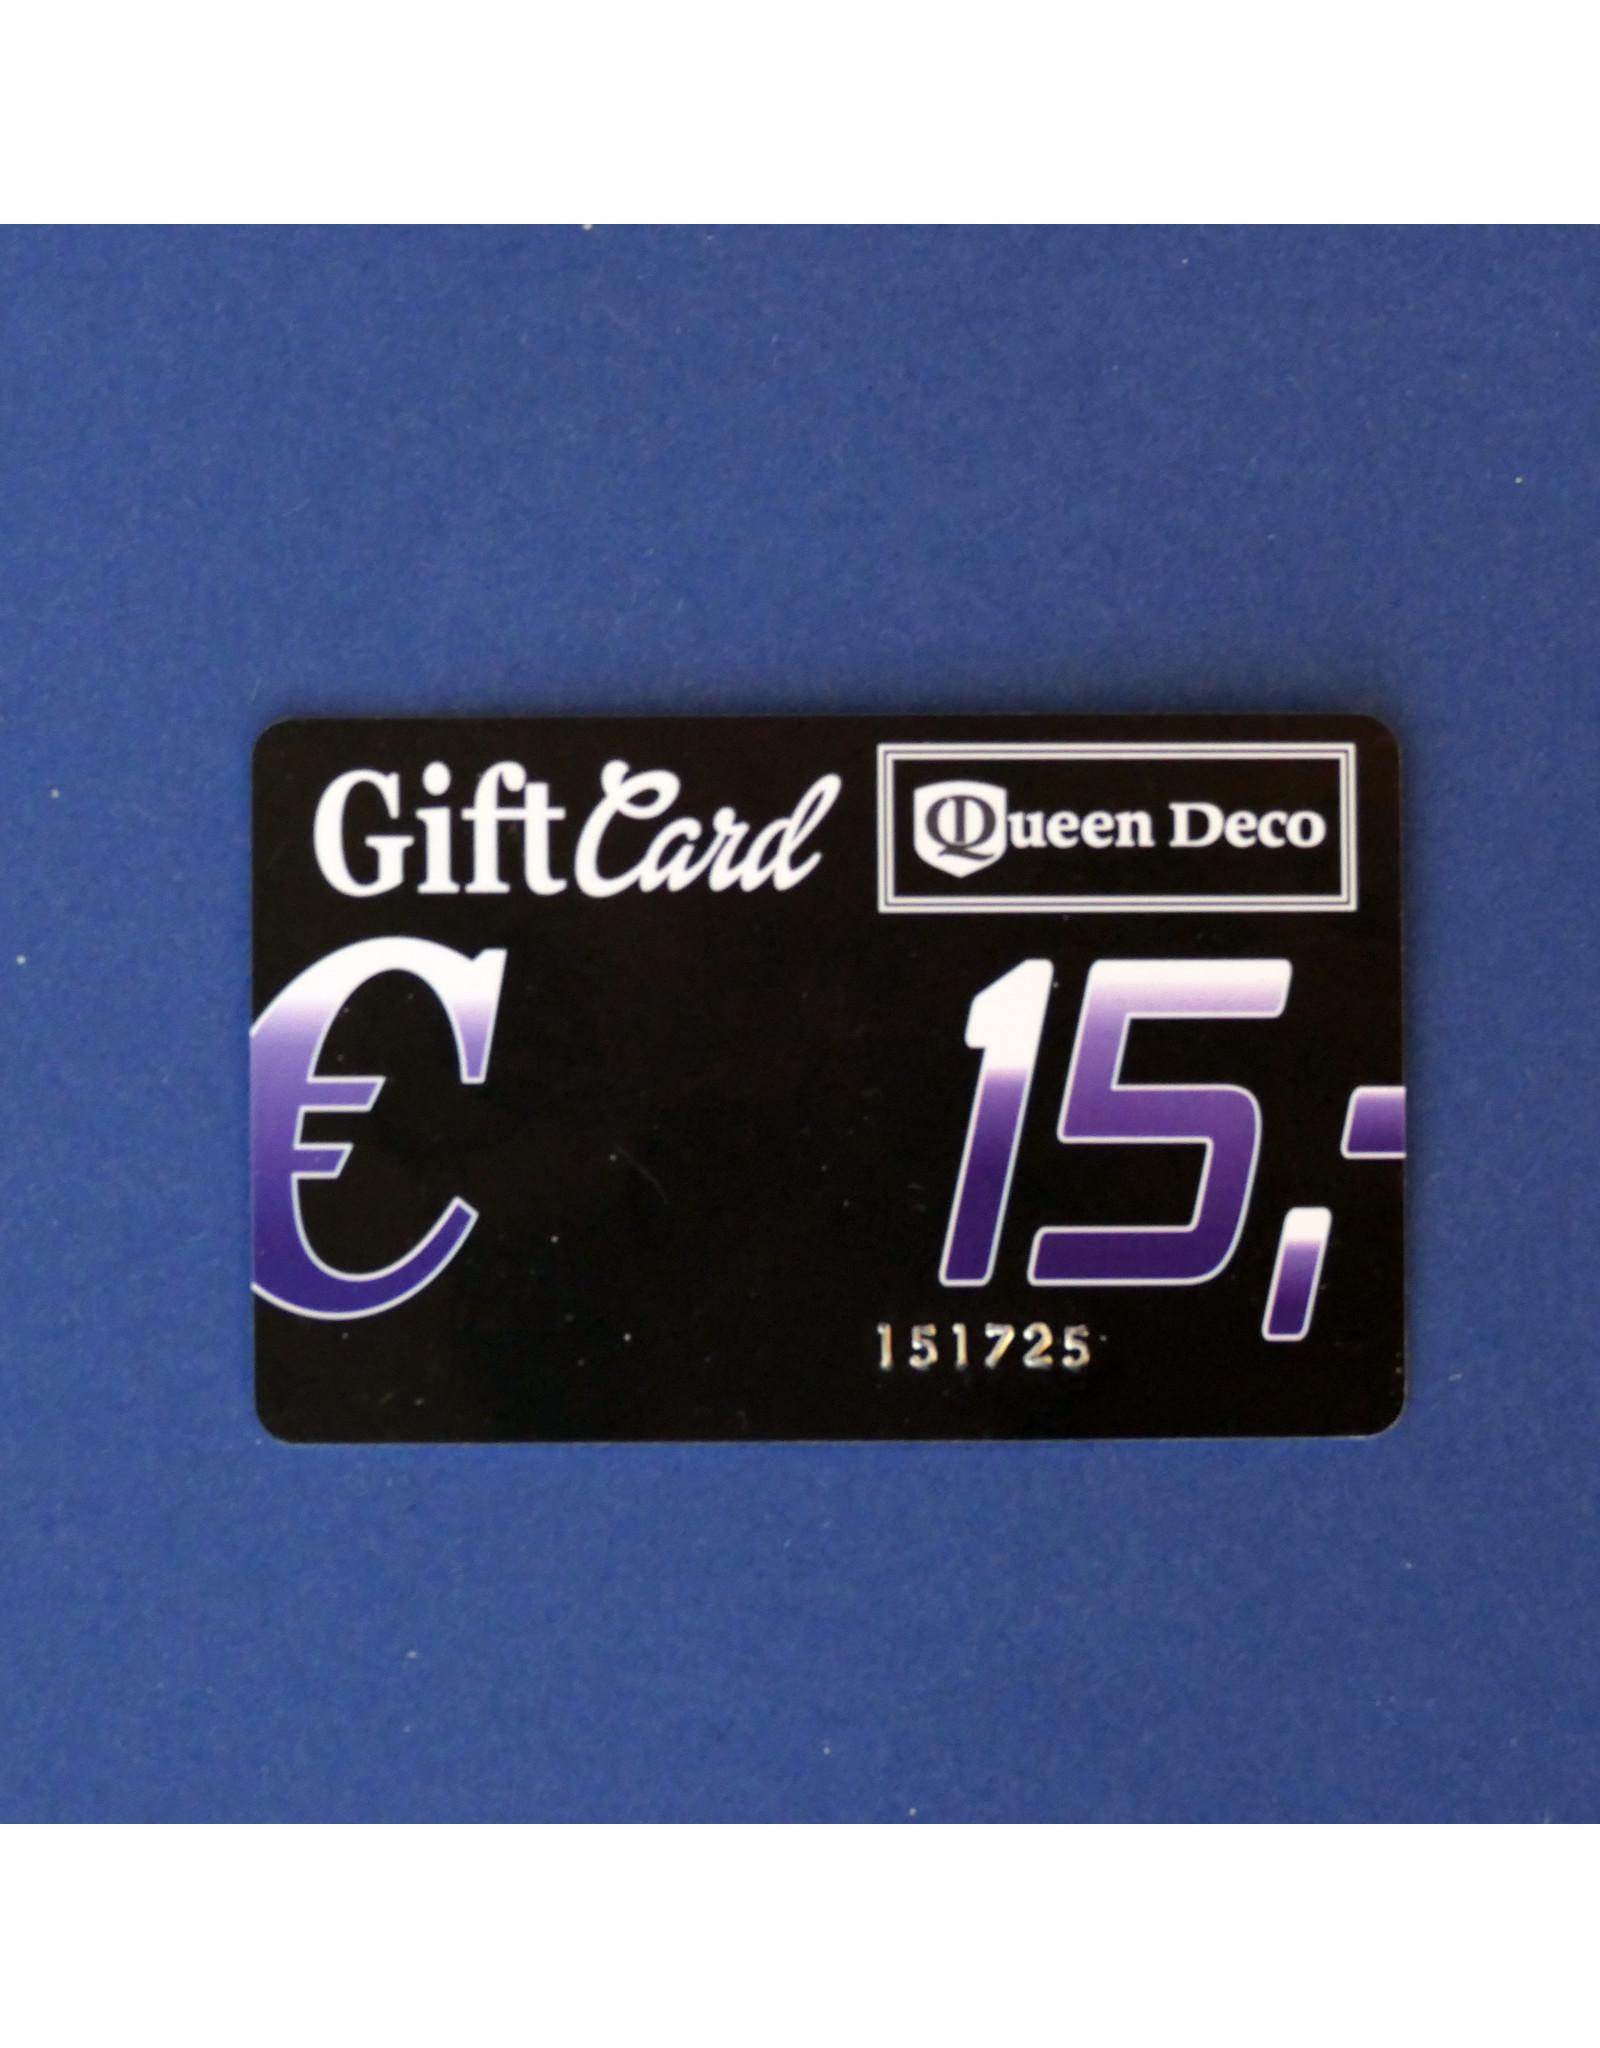 Q&D GIFTCARD CADEAUBON (GIFTCARD)  €  15.00 VIJFTIEN EURO